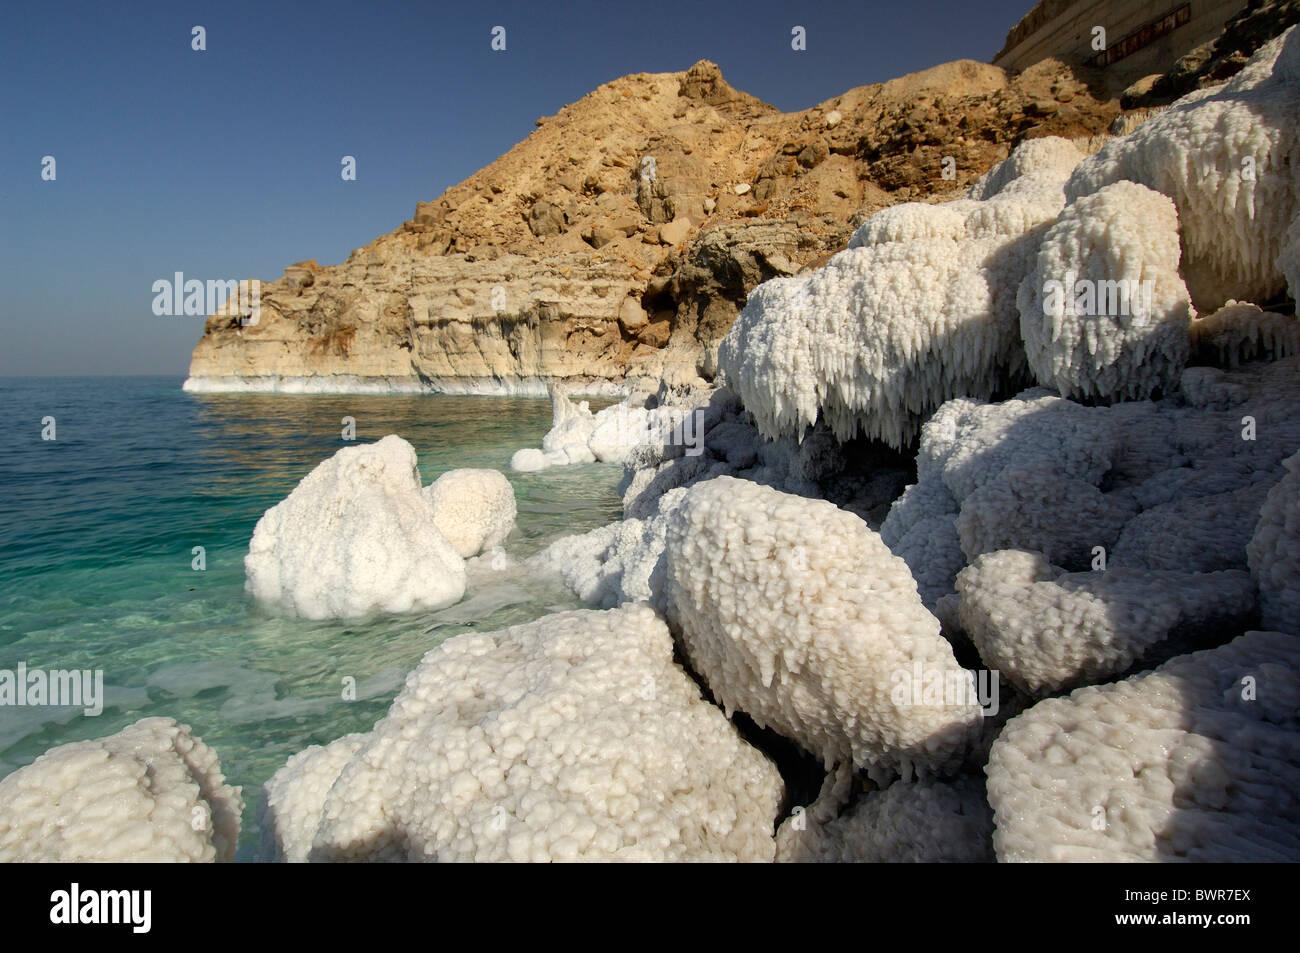 Jordan Seven Pillars of Wisdom Wadi Rum Desert Middle East landscape rock formation rocky movie Lawrence of A - Stock Image